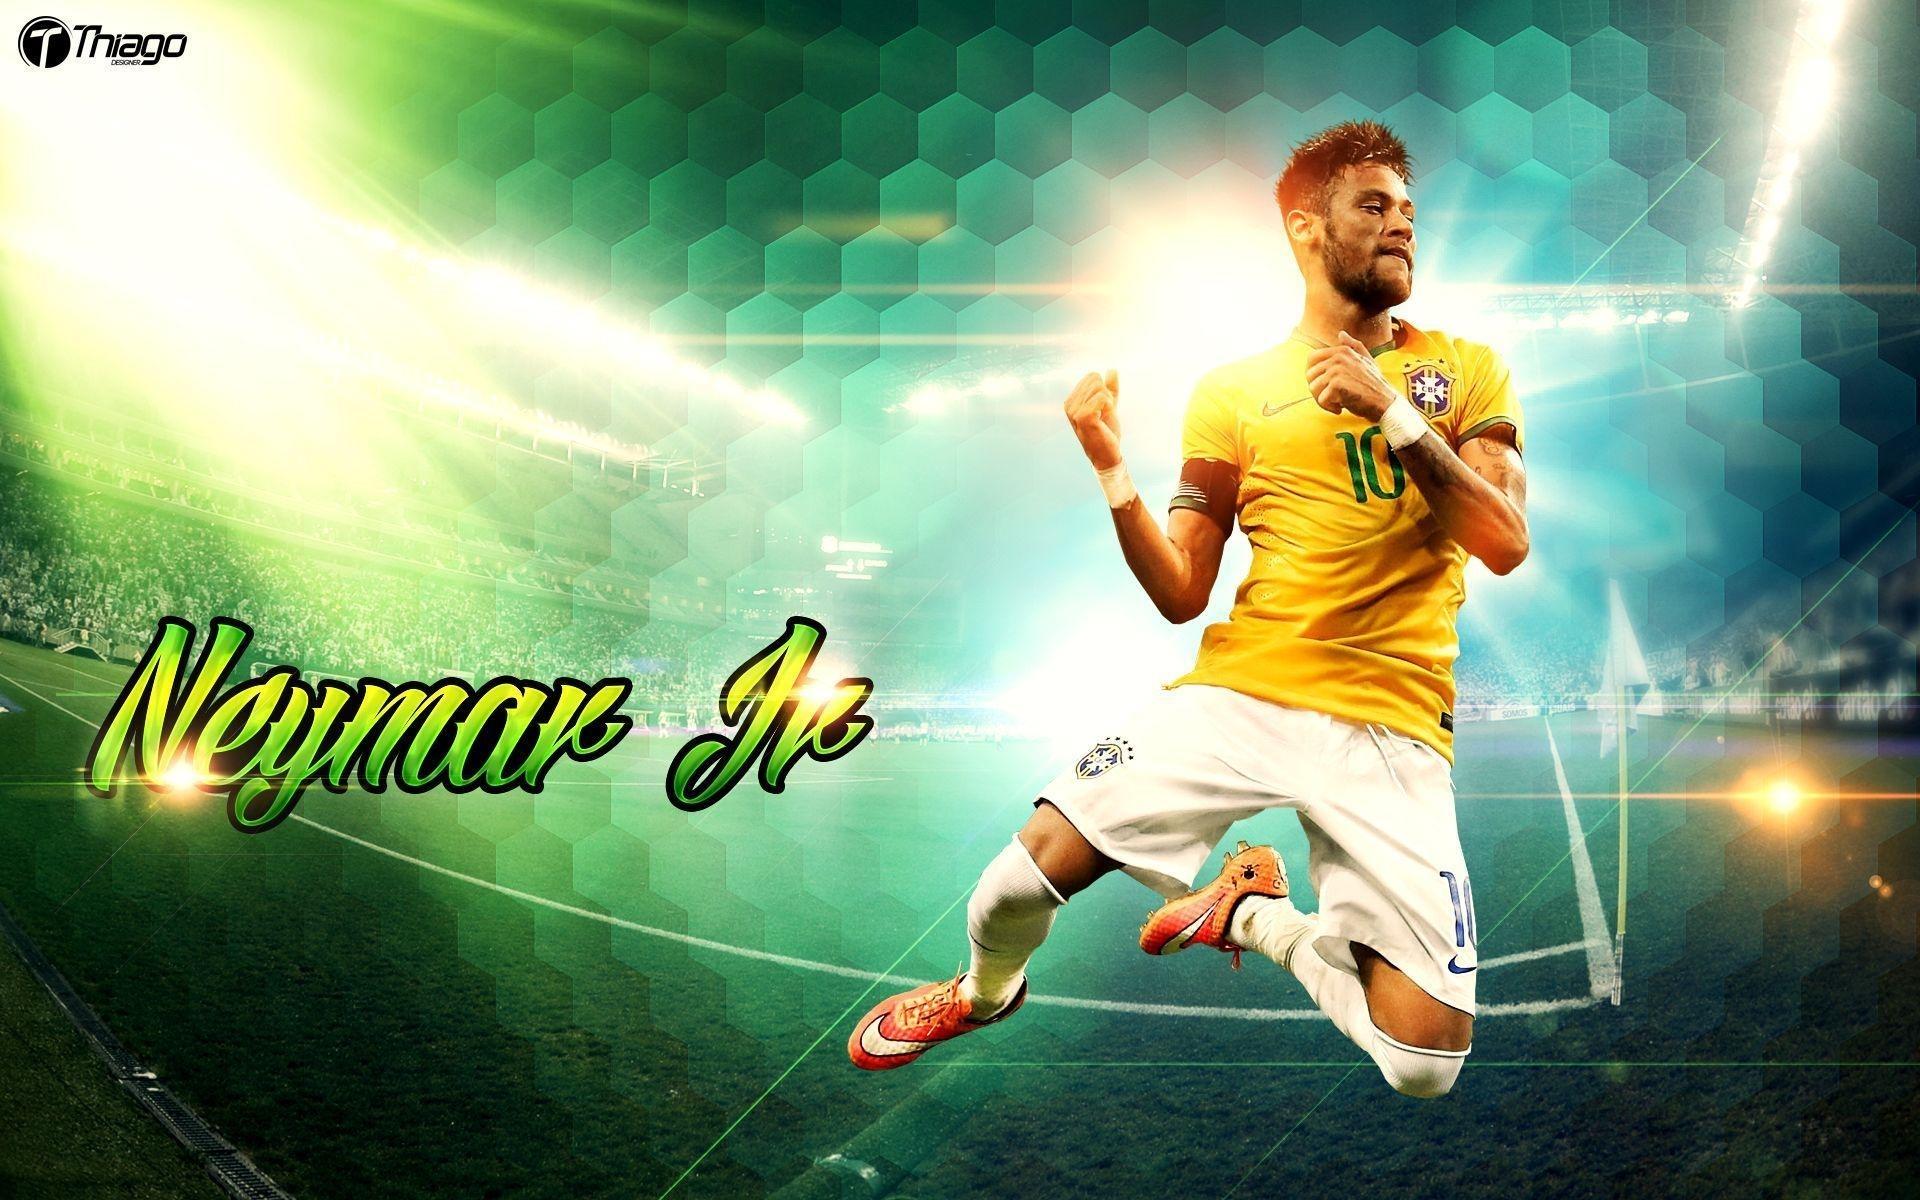 10 Top Neymar Jr Wallpaper 2015 FULL HD 1920×1080 For PC Desktop